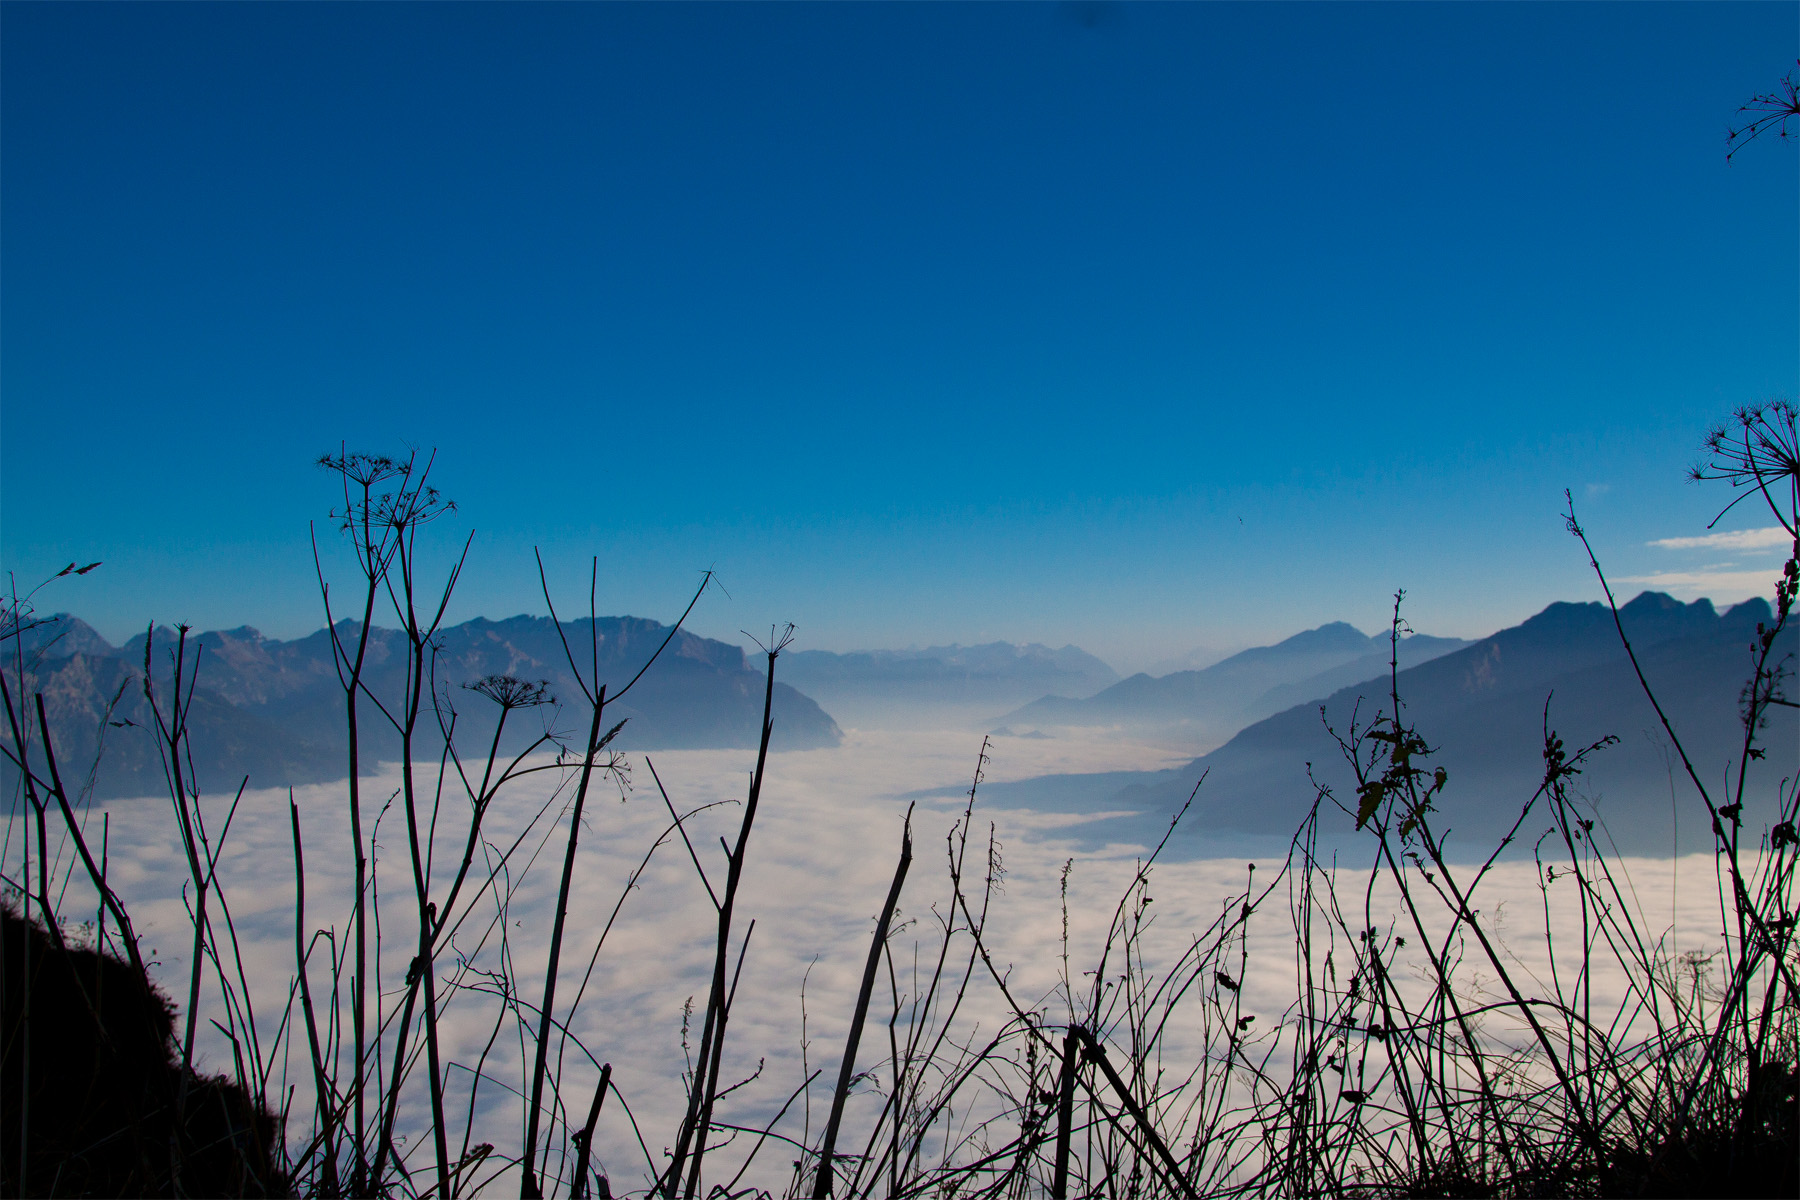 Blick auf das Nebelmeer Oberes Rheintal Richtung Chur